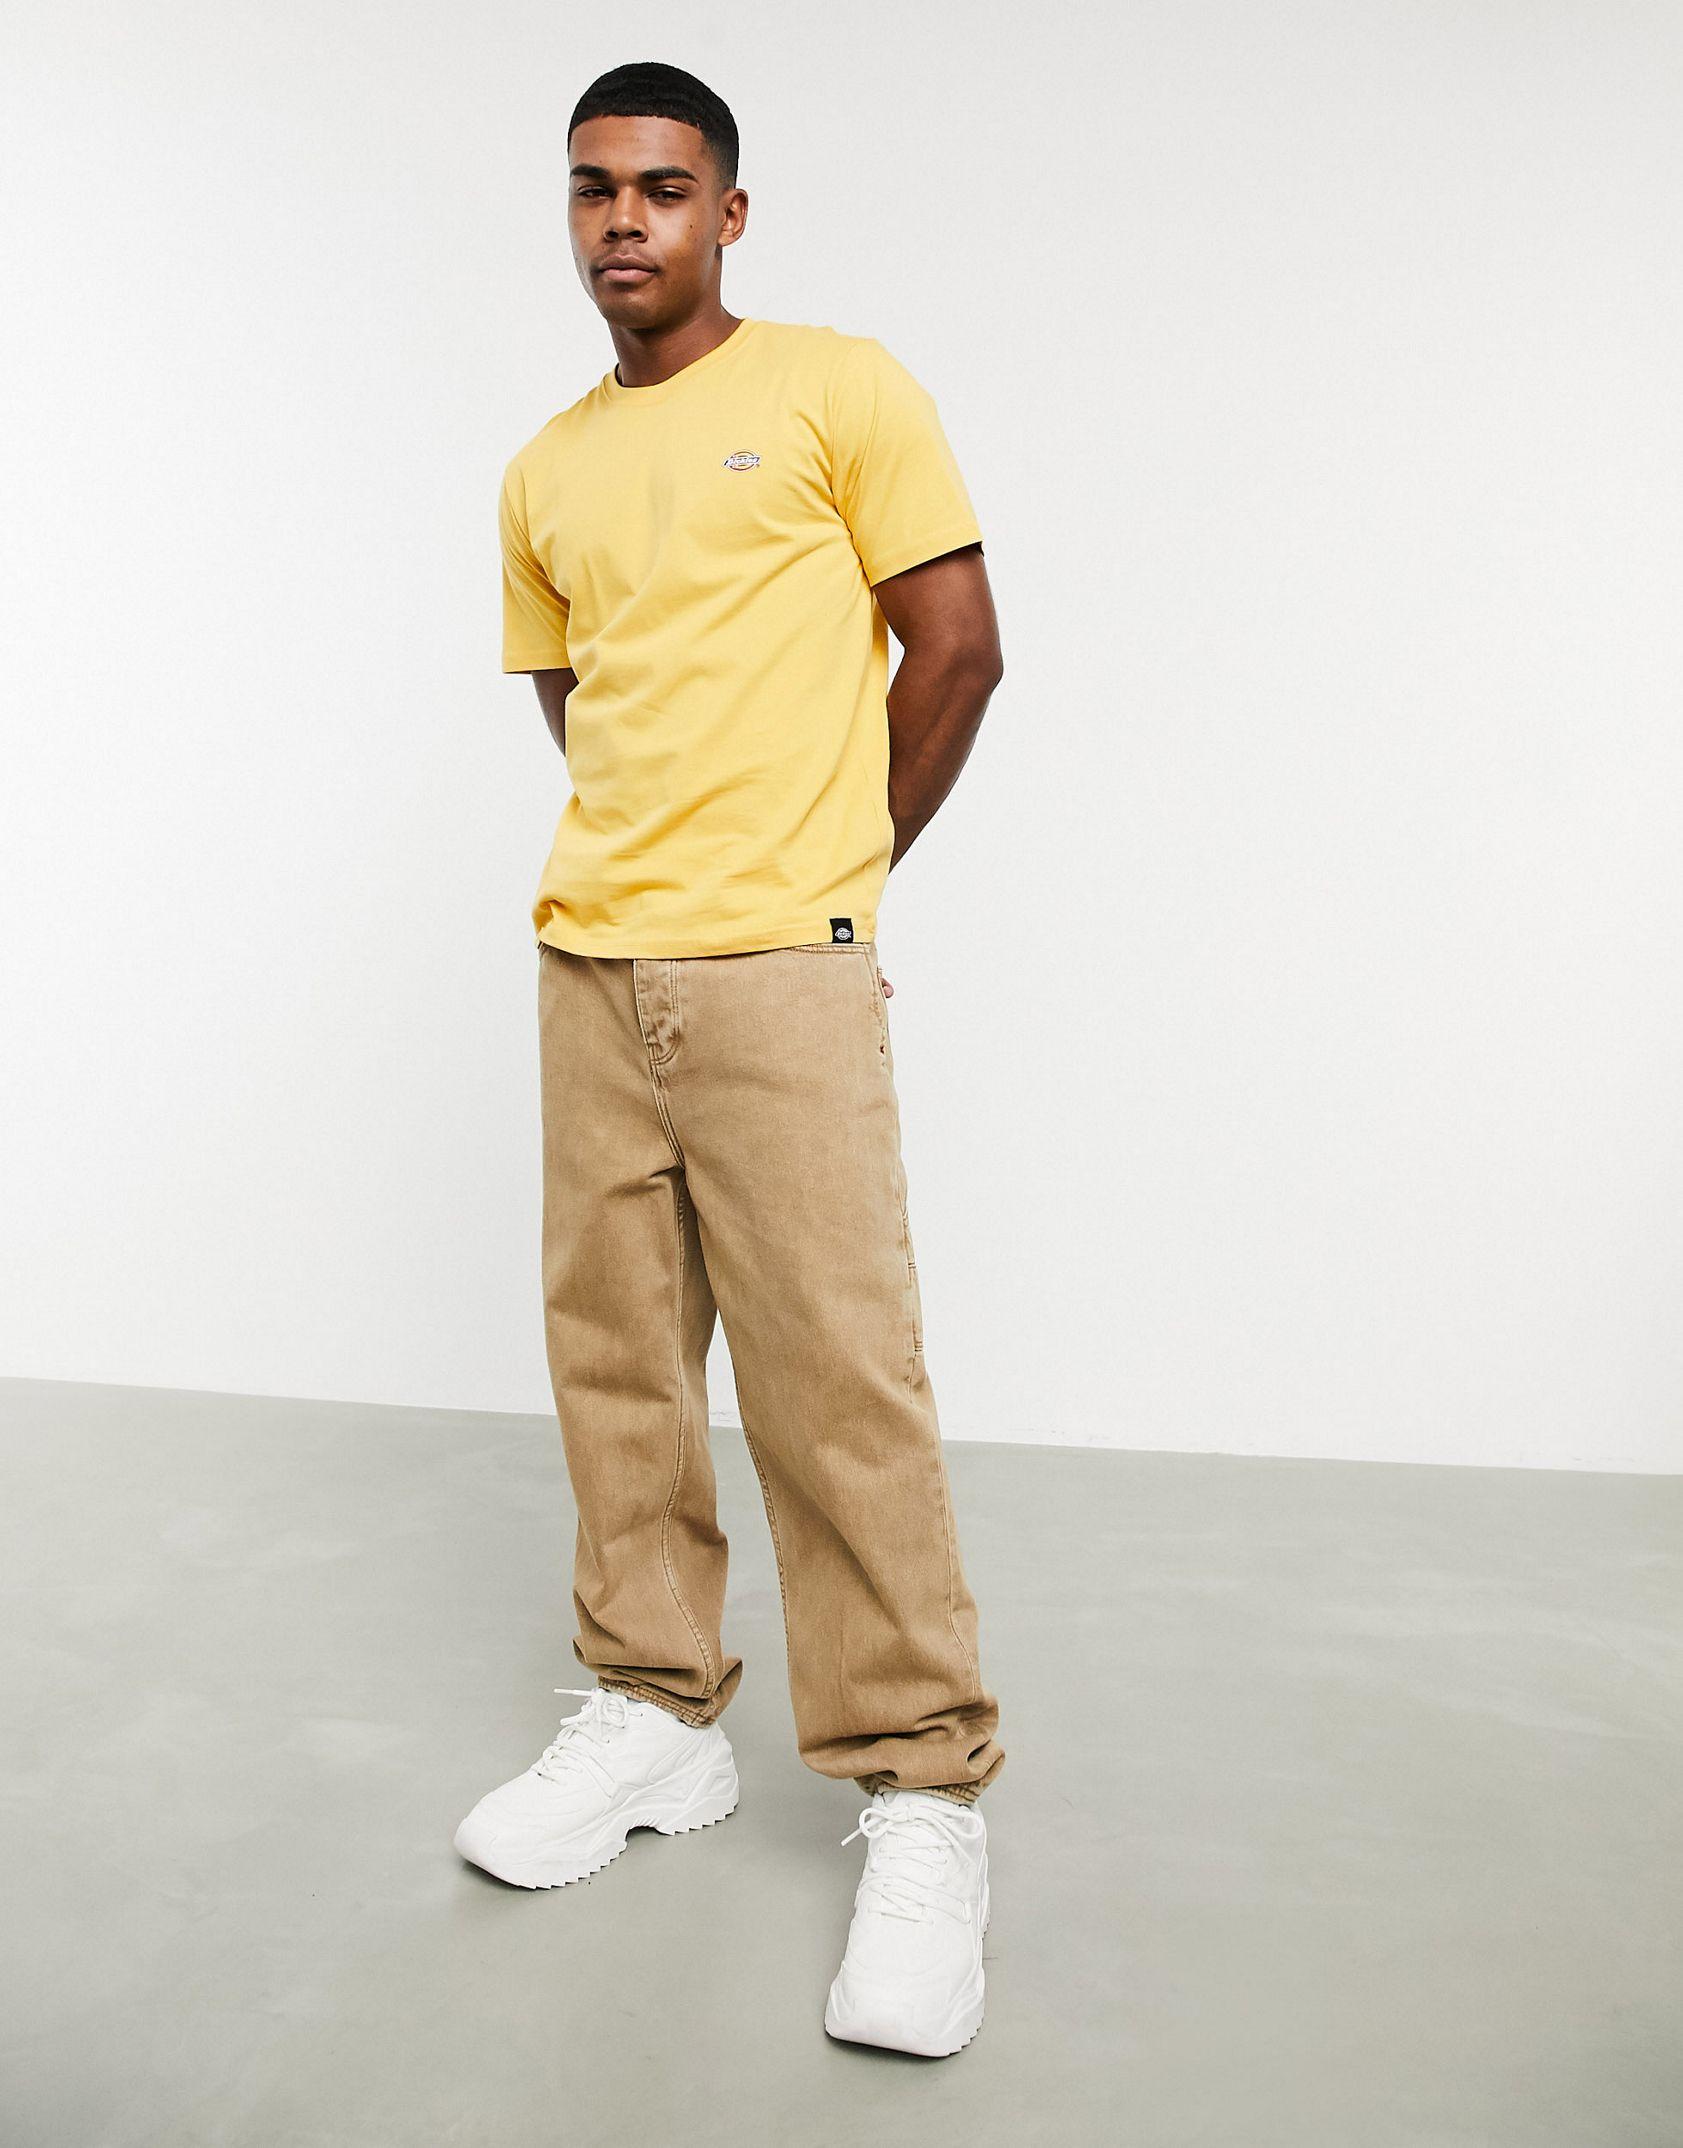 Dickies Stockdale regular t-shirt in yellow - ASOS Price Checker